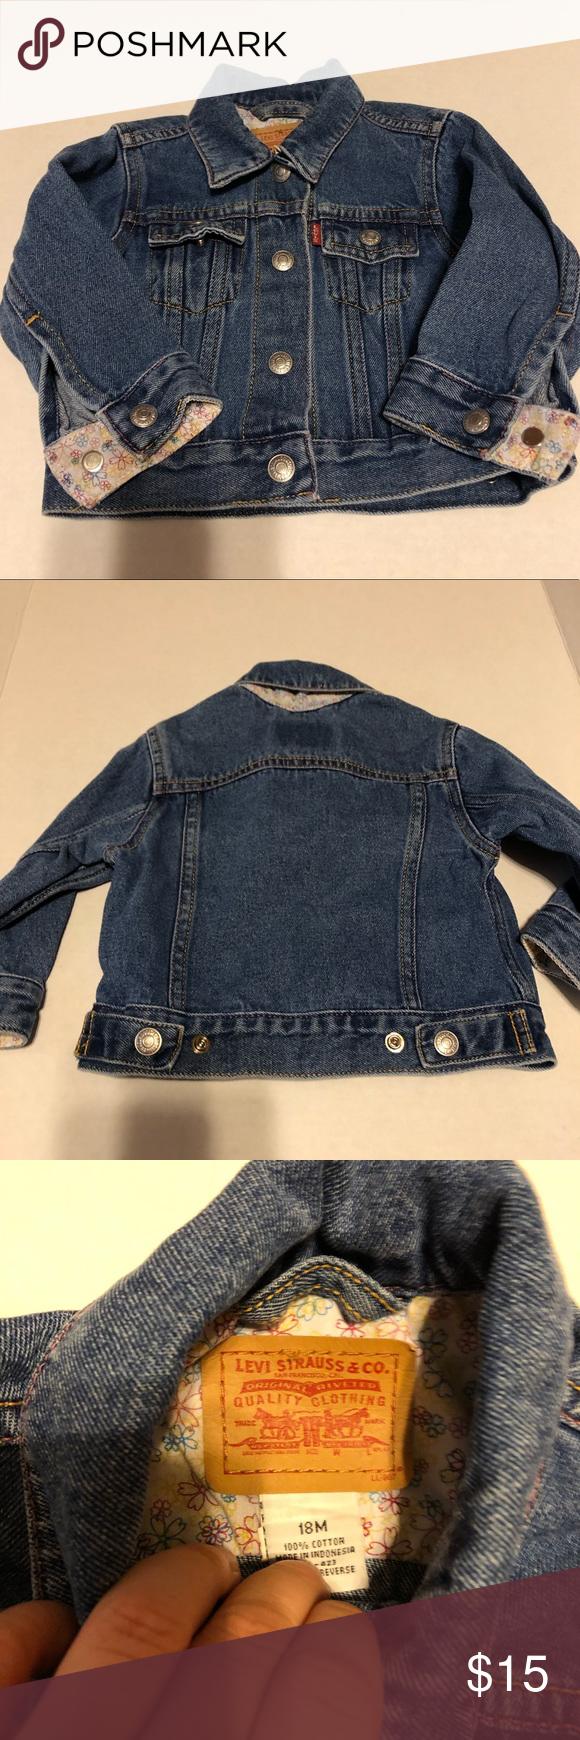 Levi S Girls Denim Jacket 18 Months Levi S Baby Girls Jean Jacket 18 Months Smoke Free Home Levi S Ja Girls Denim Jacket Jean Jacket For Girls Baby Girl Jeans [ 1740 x 580 Pixel ]